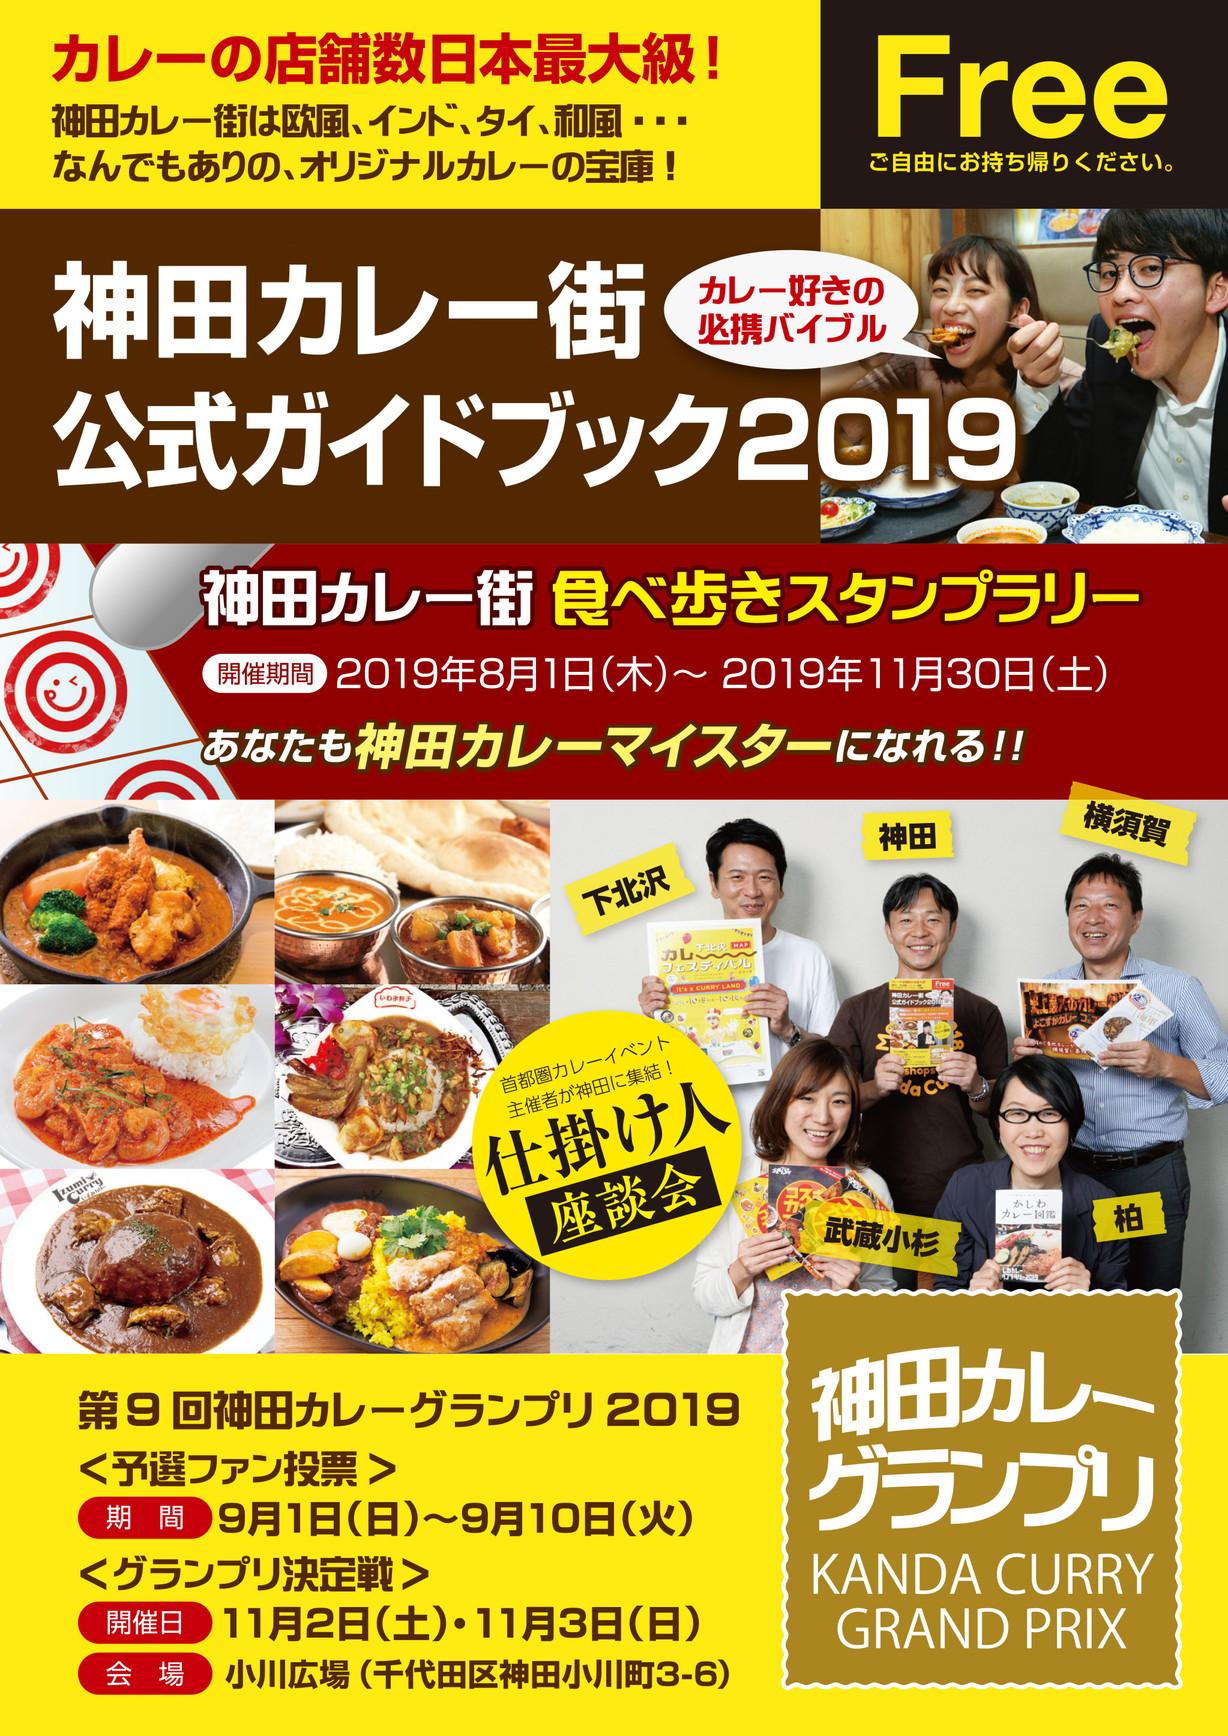 The ninth Kanda curry Grand Prix 2019